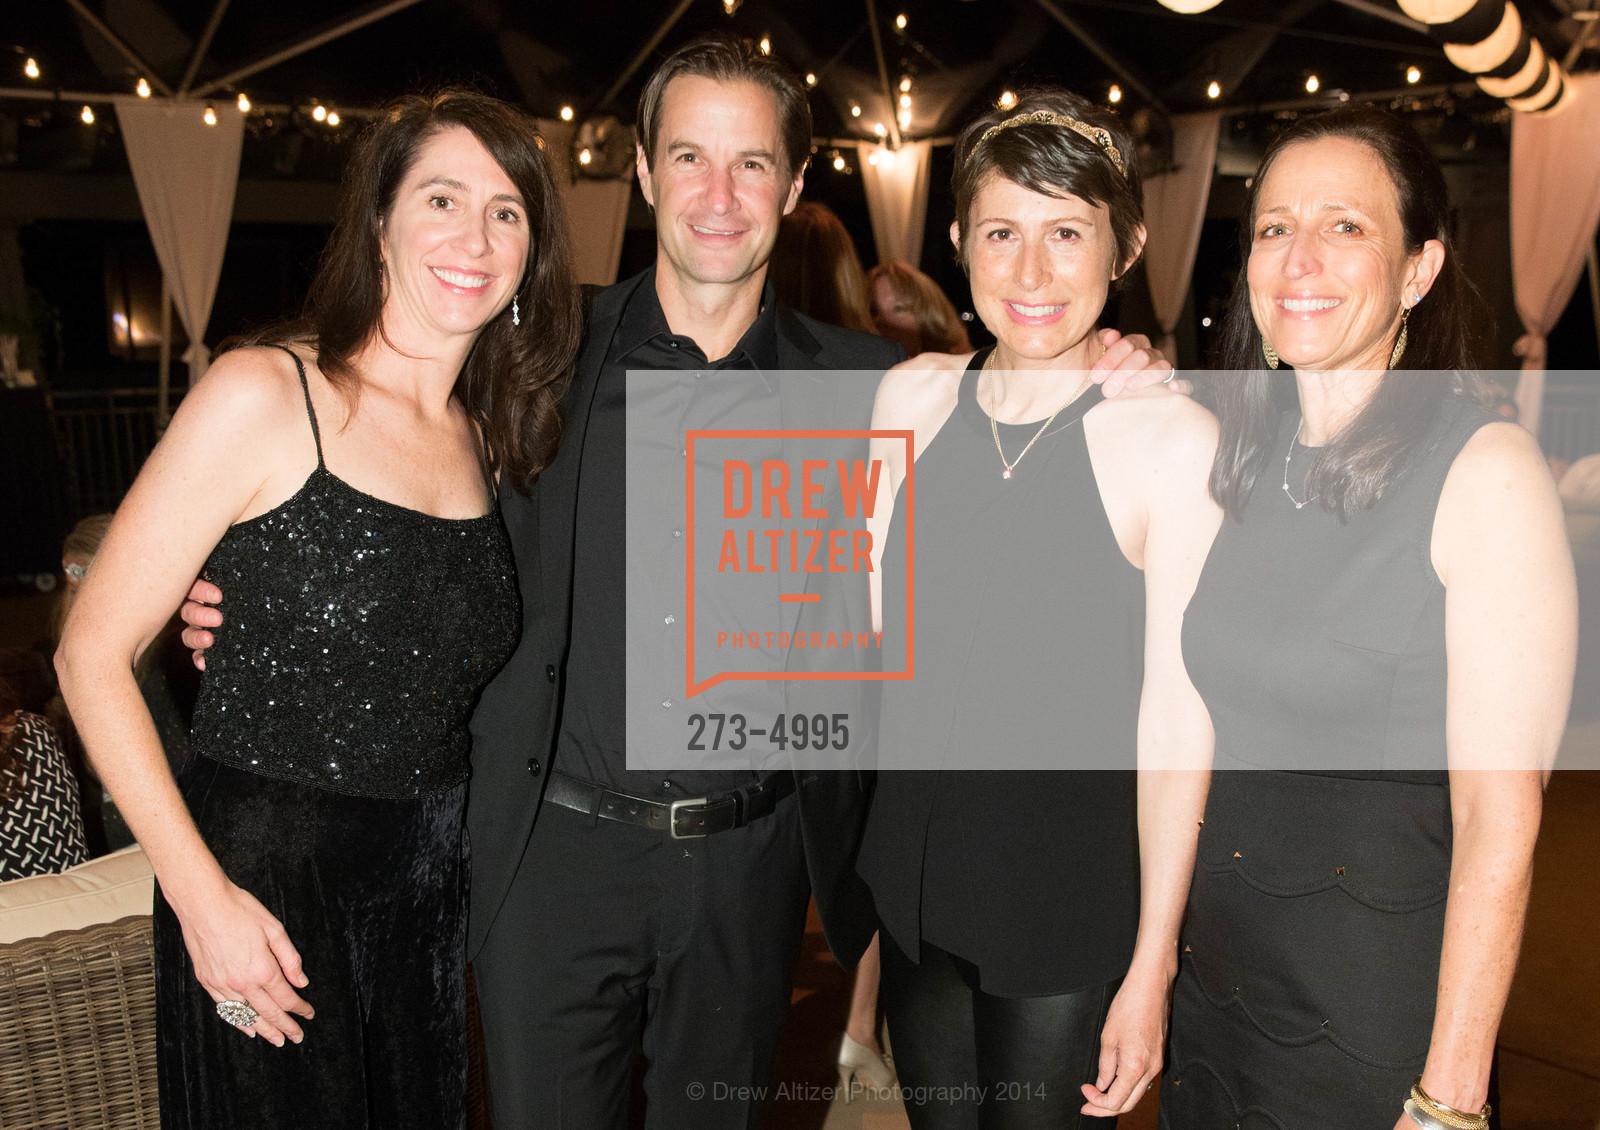 Kristen McCarthy, Brett Habermann, Sarah Berger, Beth Hilliard, Photo #273-4995